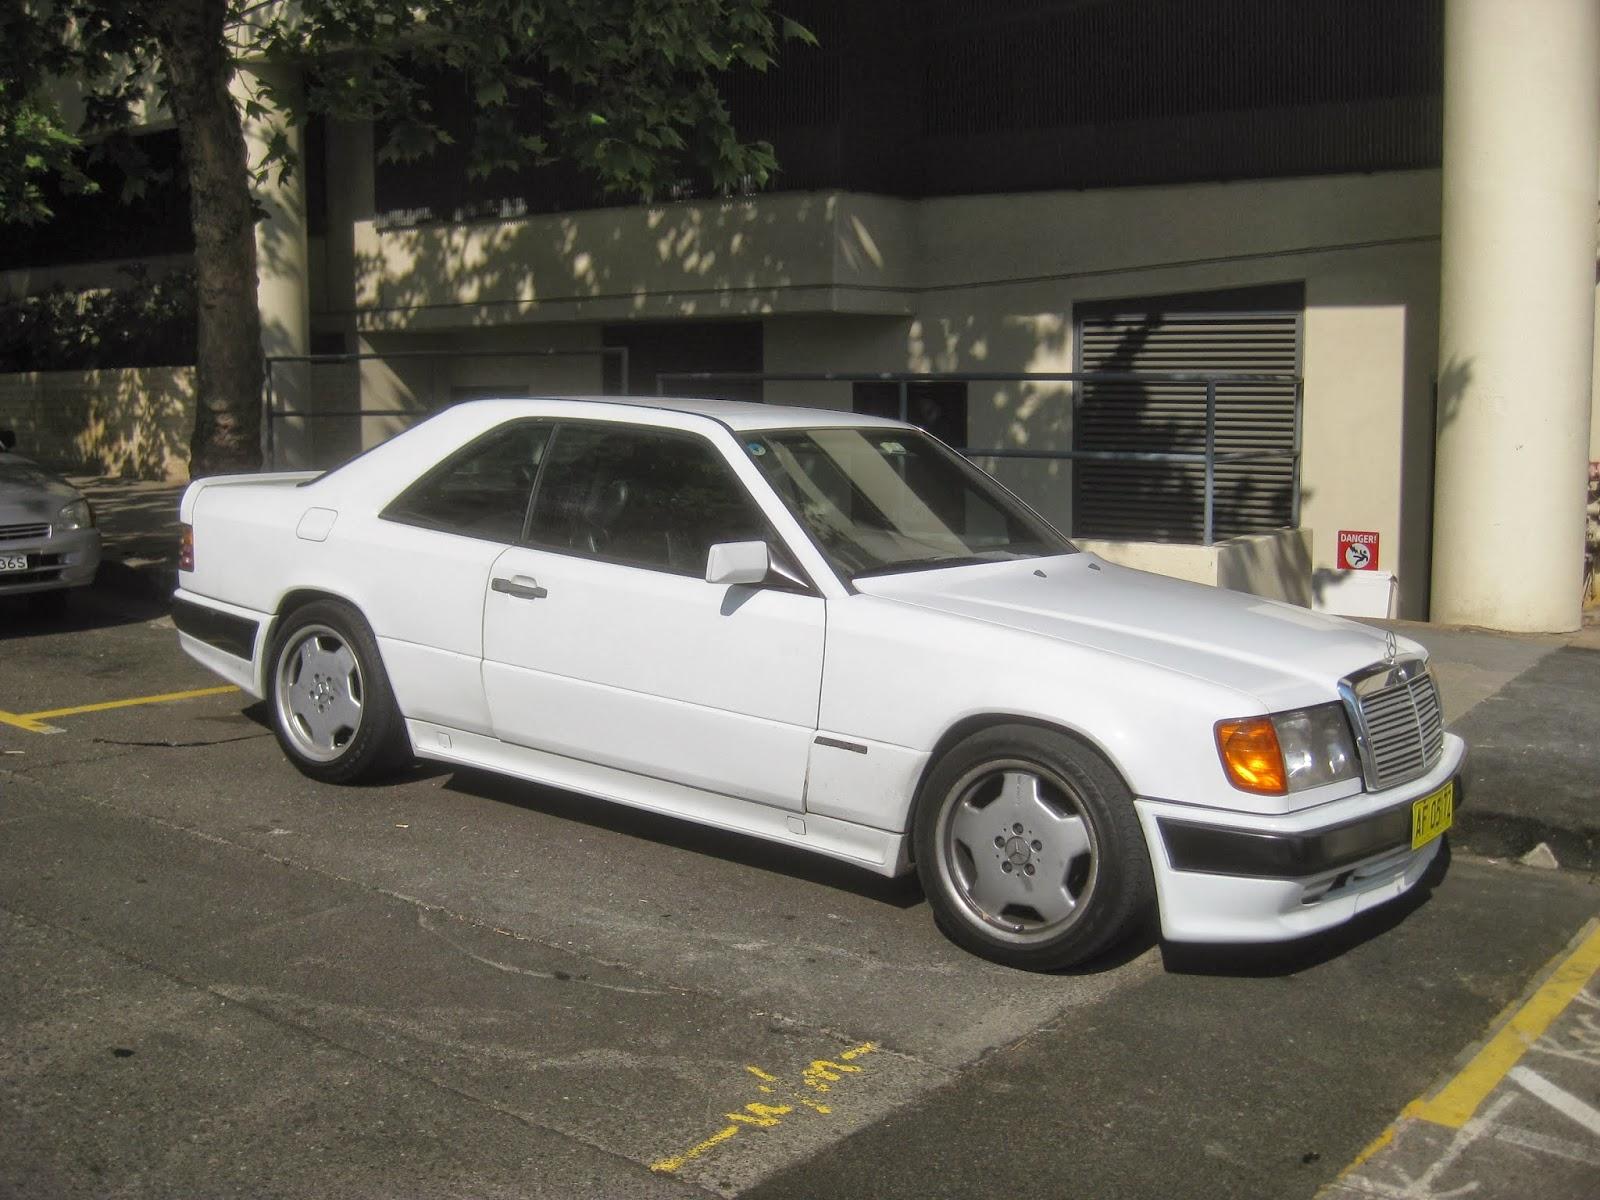 aussie old parked cars 1988 mercedes benz w124 300 ce amg. Black Bedroom Furniture Sets. Home Design Ideas